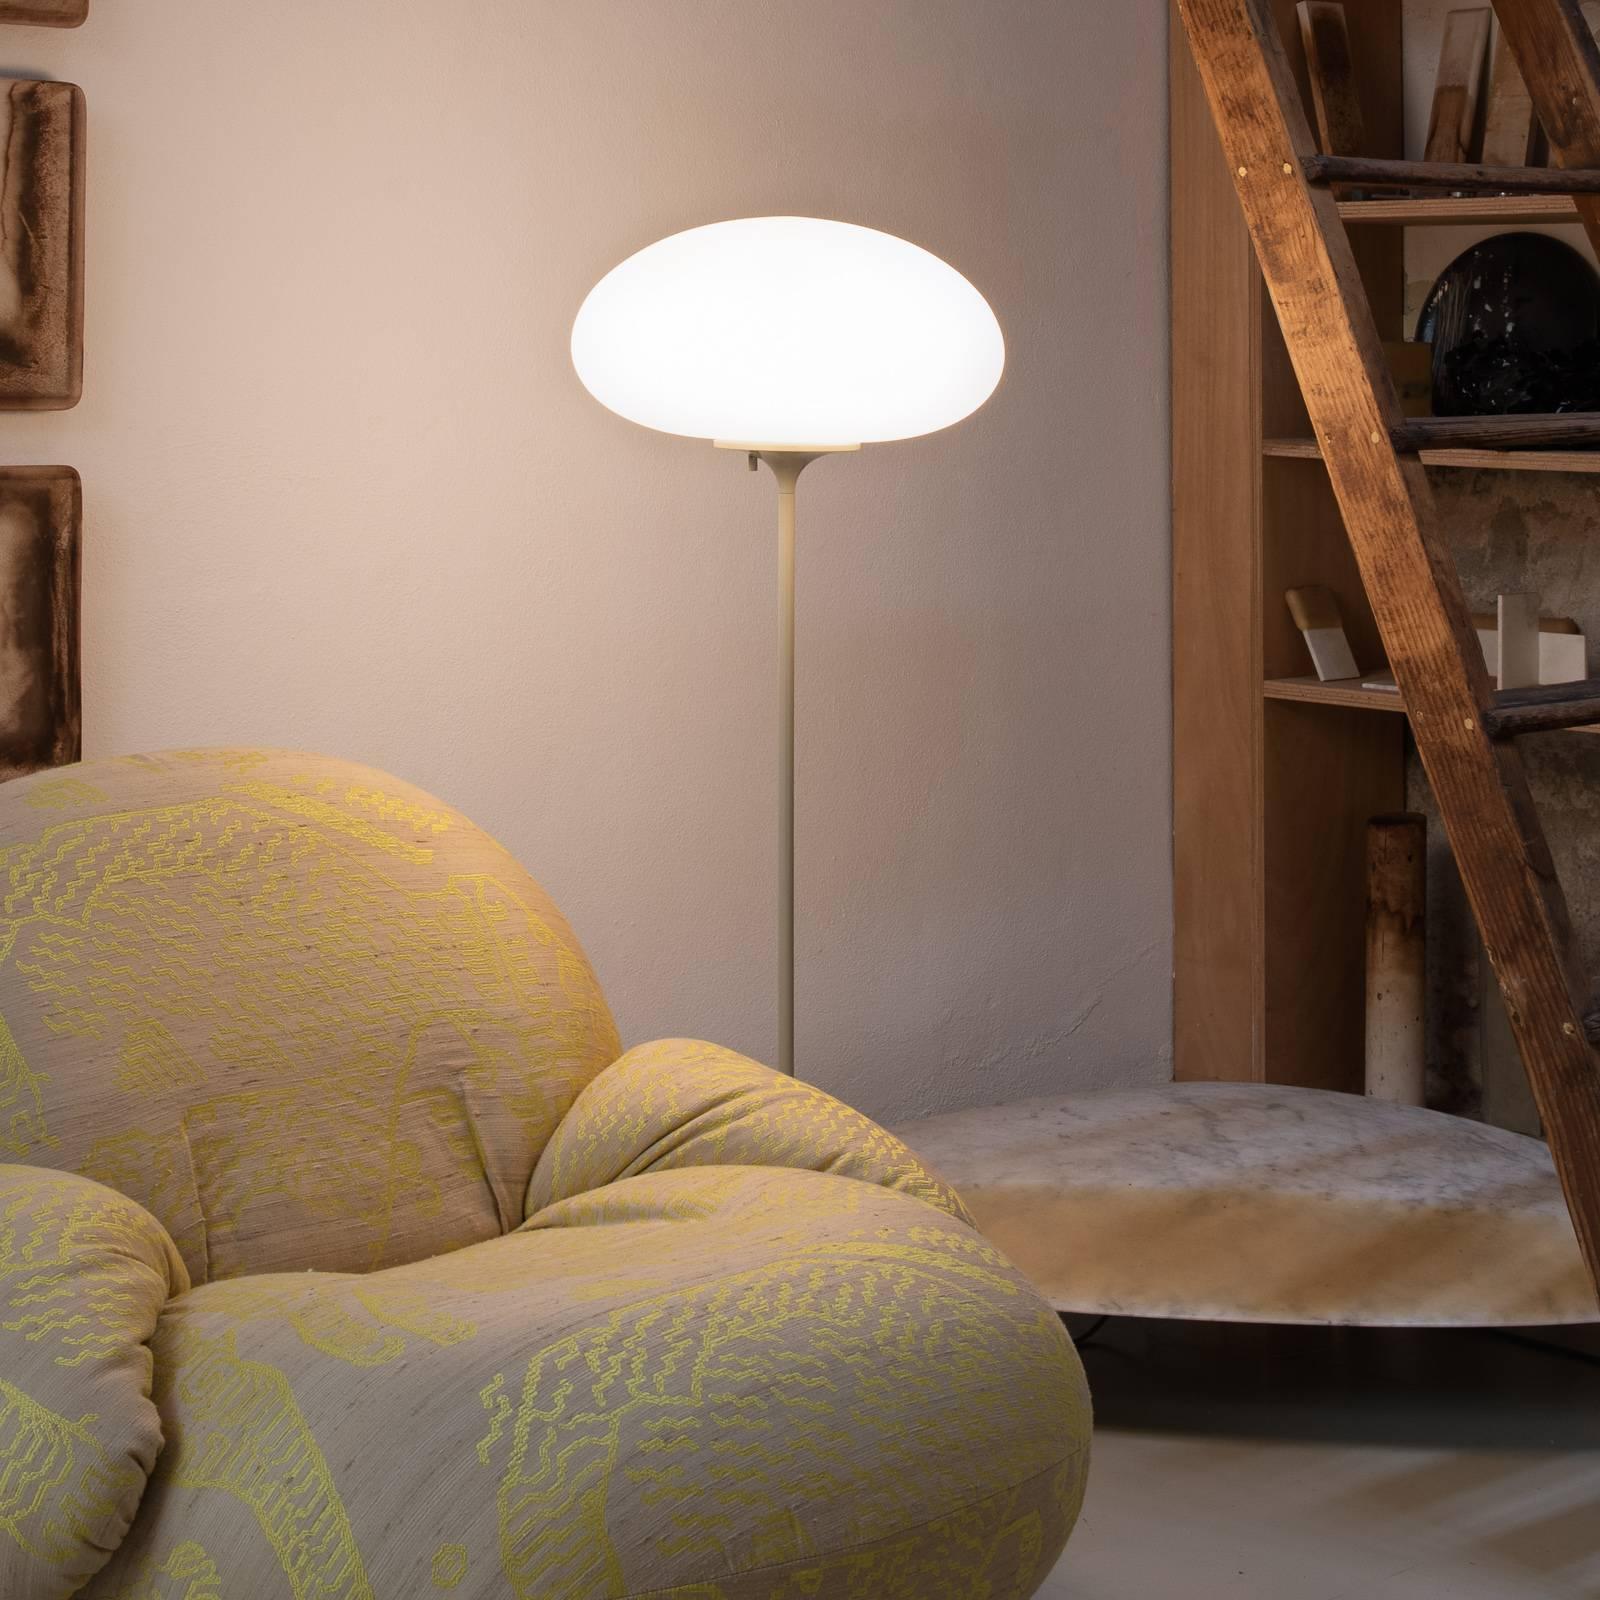 GUBI Stemlite -lattiavalaisin, harmaa, 110 cm